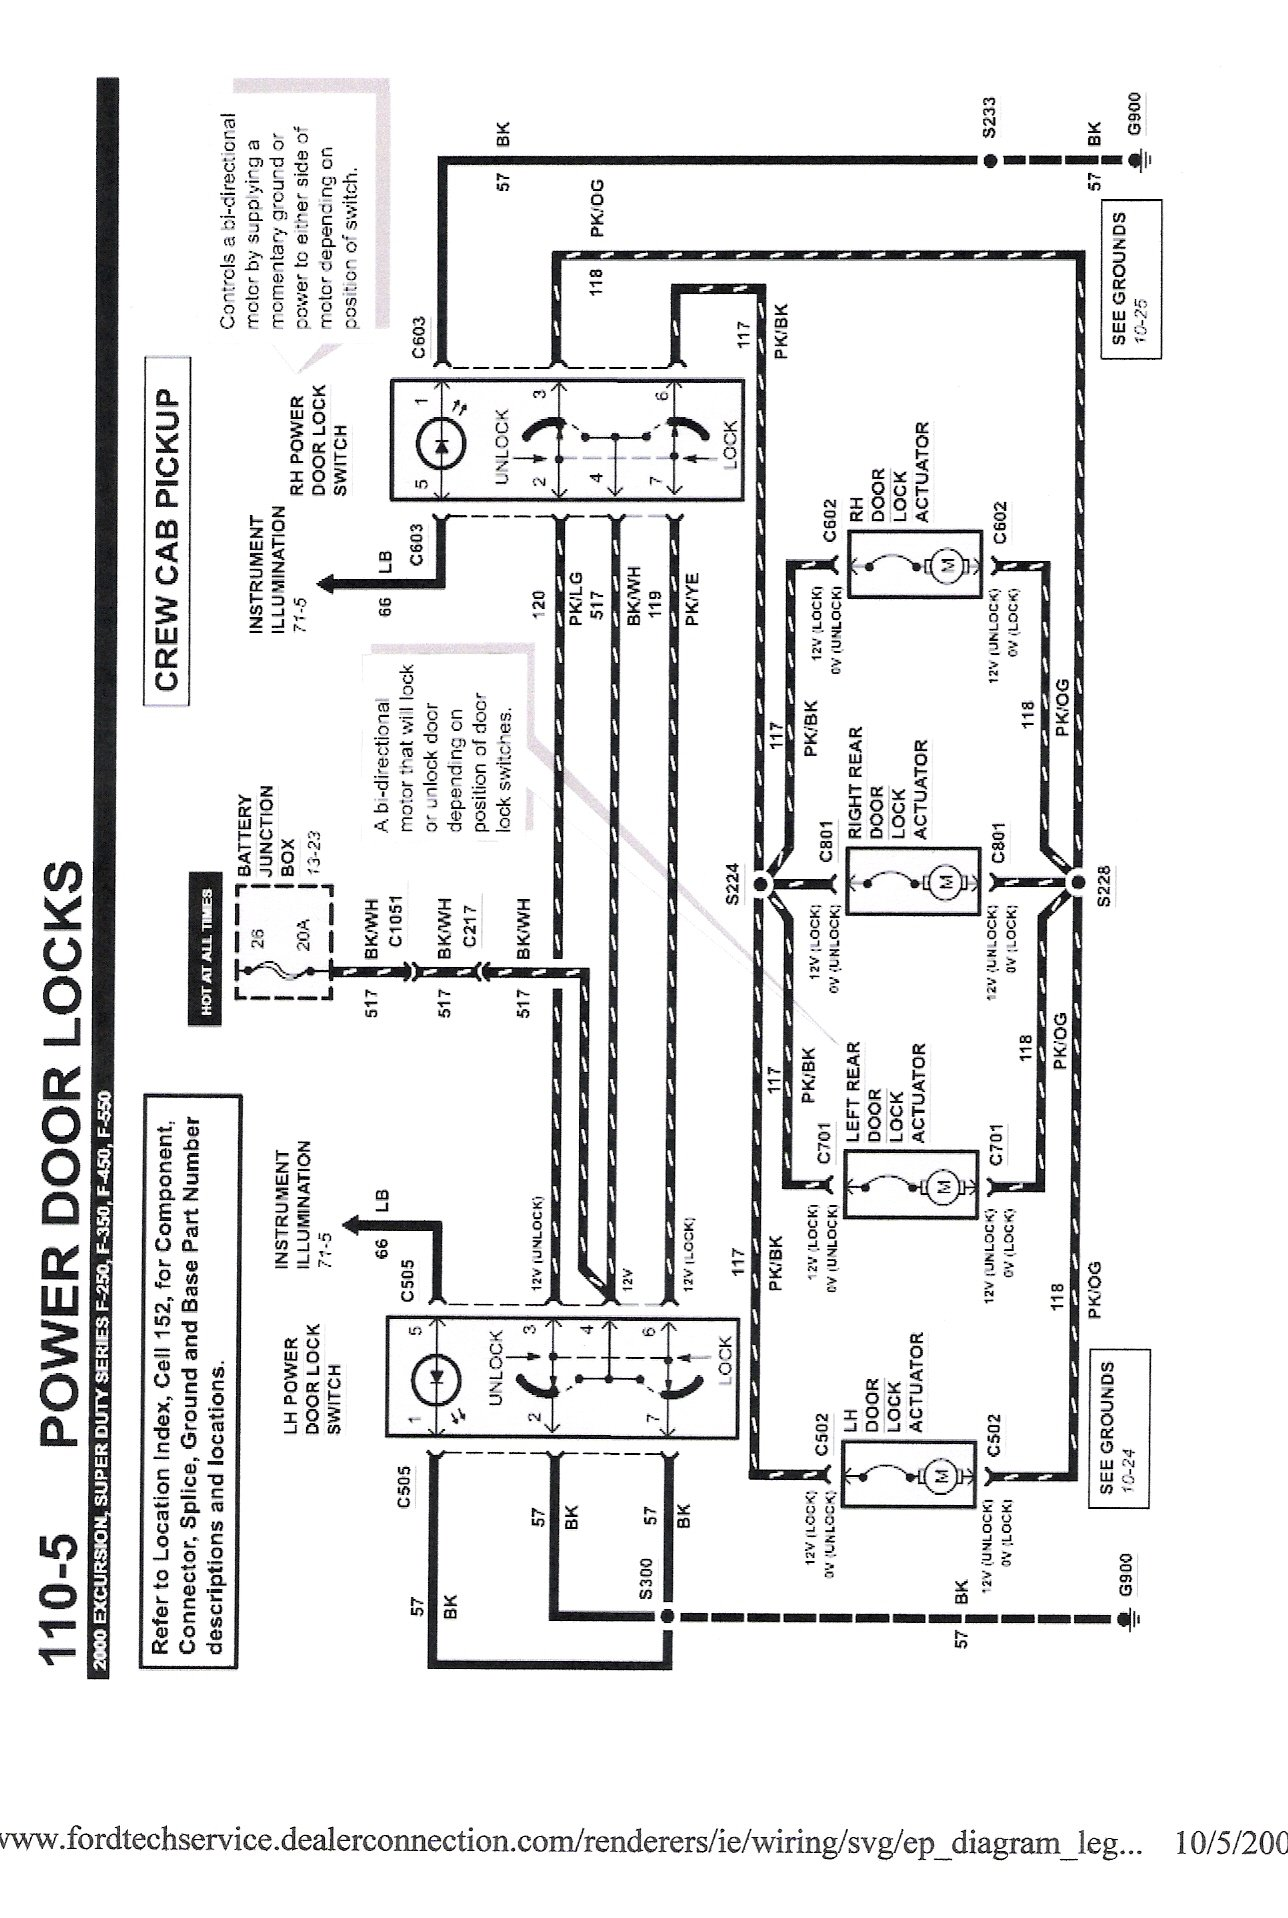 F450 Wiring Diagram For Automatic Door Locks Electrical 1989 Gmc Sierra Diagrams Explained 1997 Chevy Silverado Lock Actuator